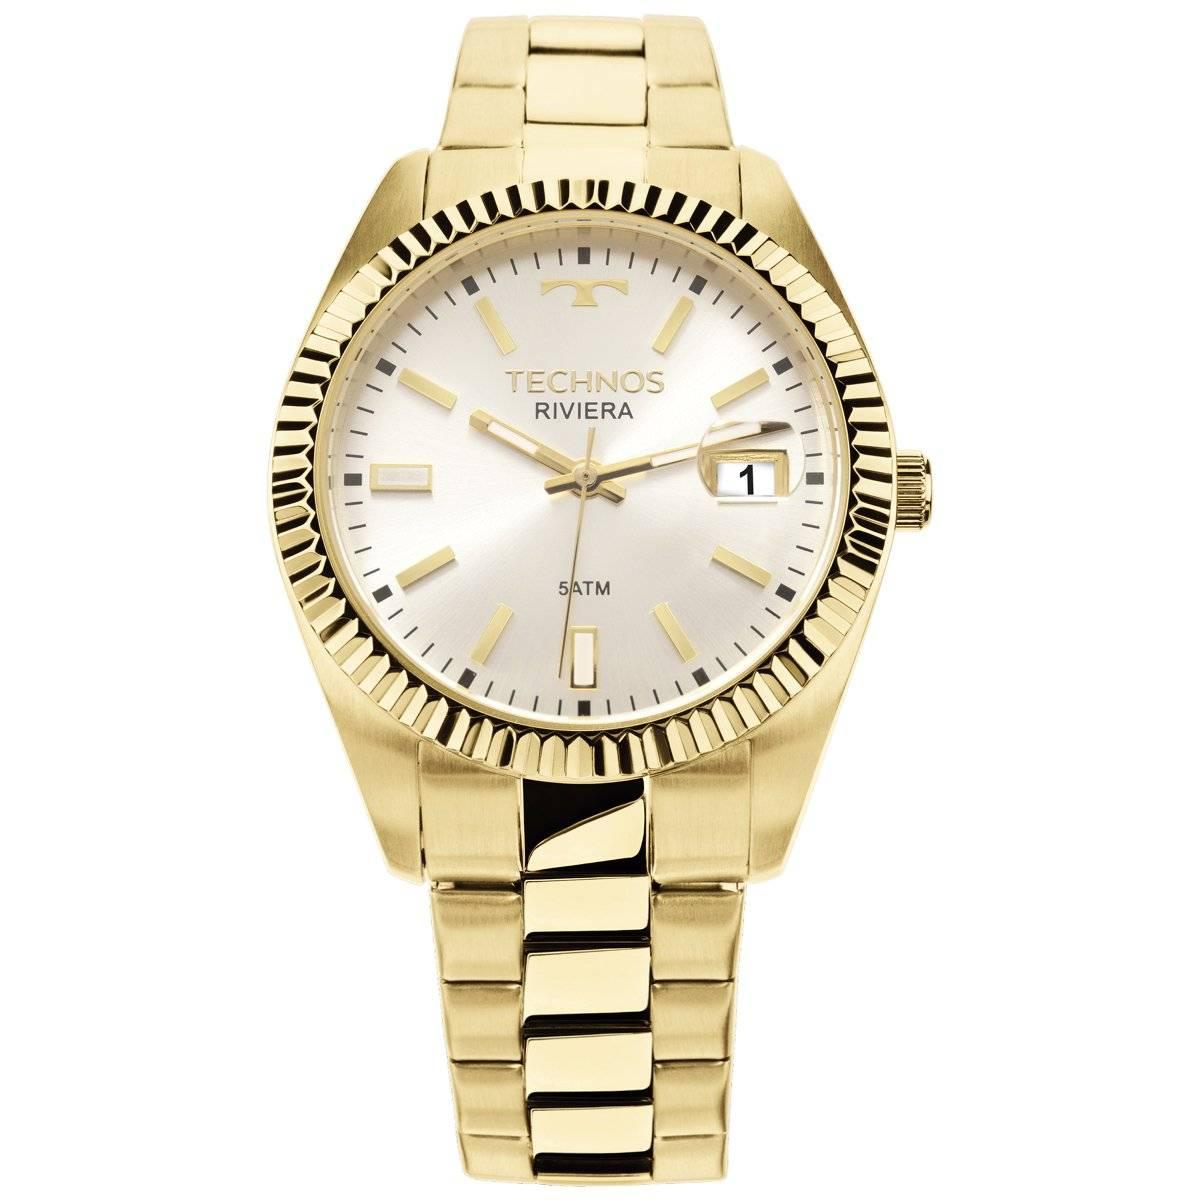 Relógio Technos Elegance Riviera Feminino Quartz 2115KTR/4K